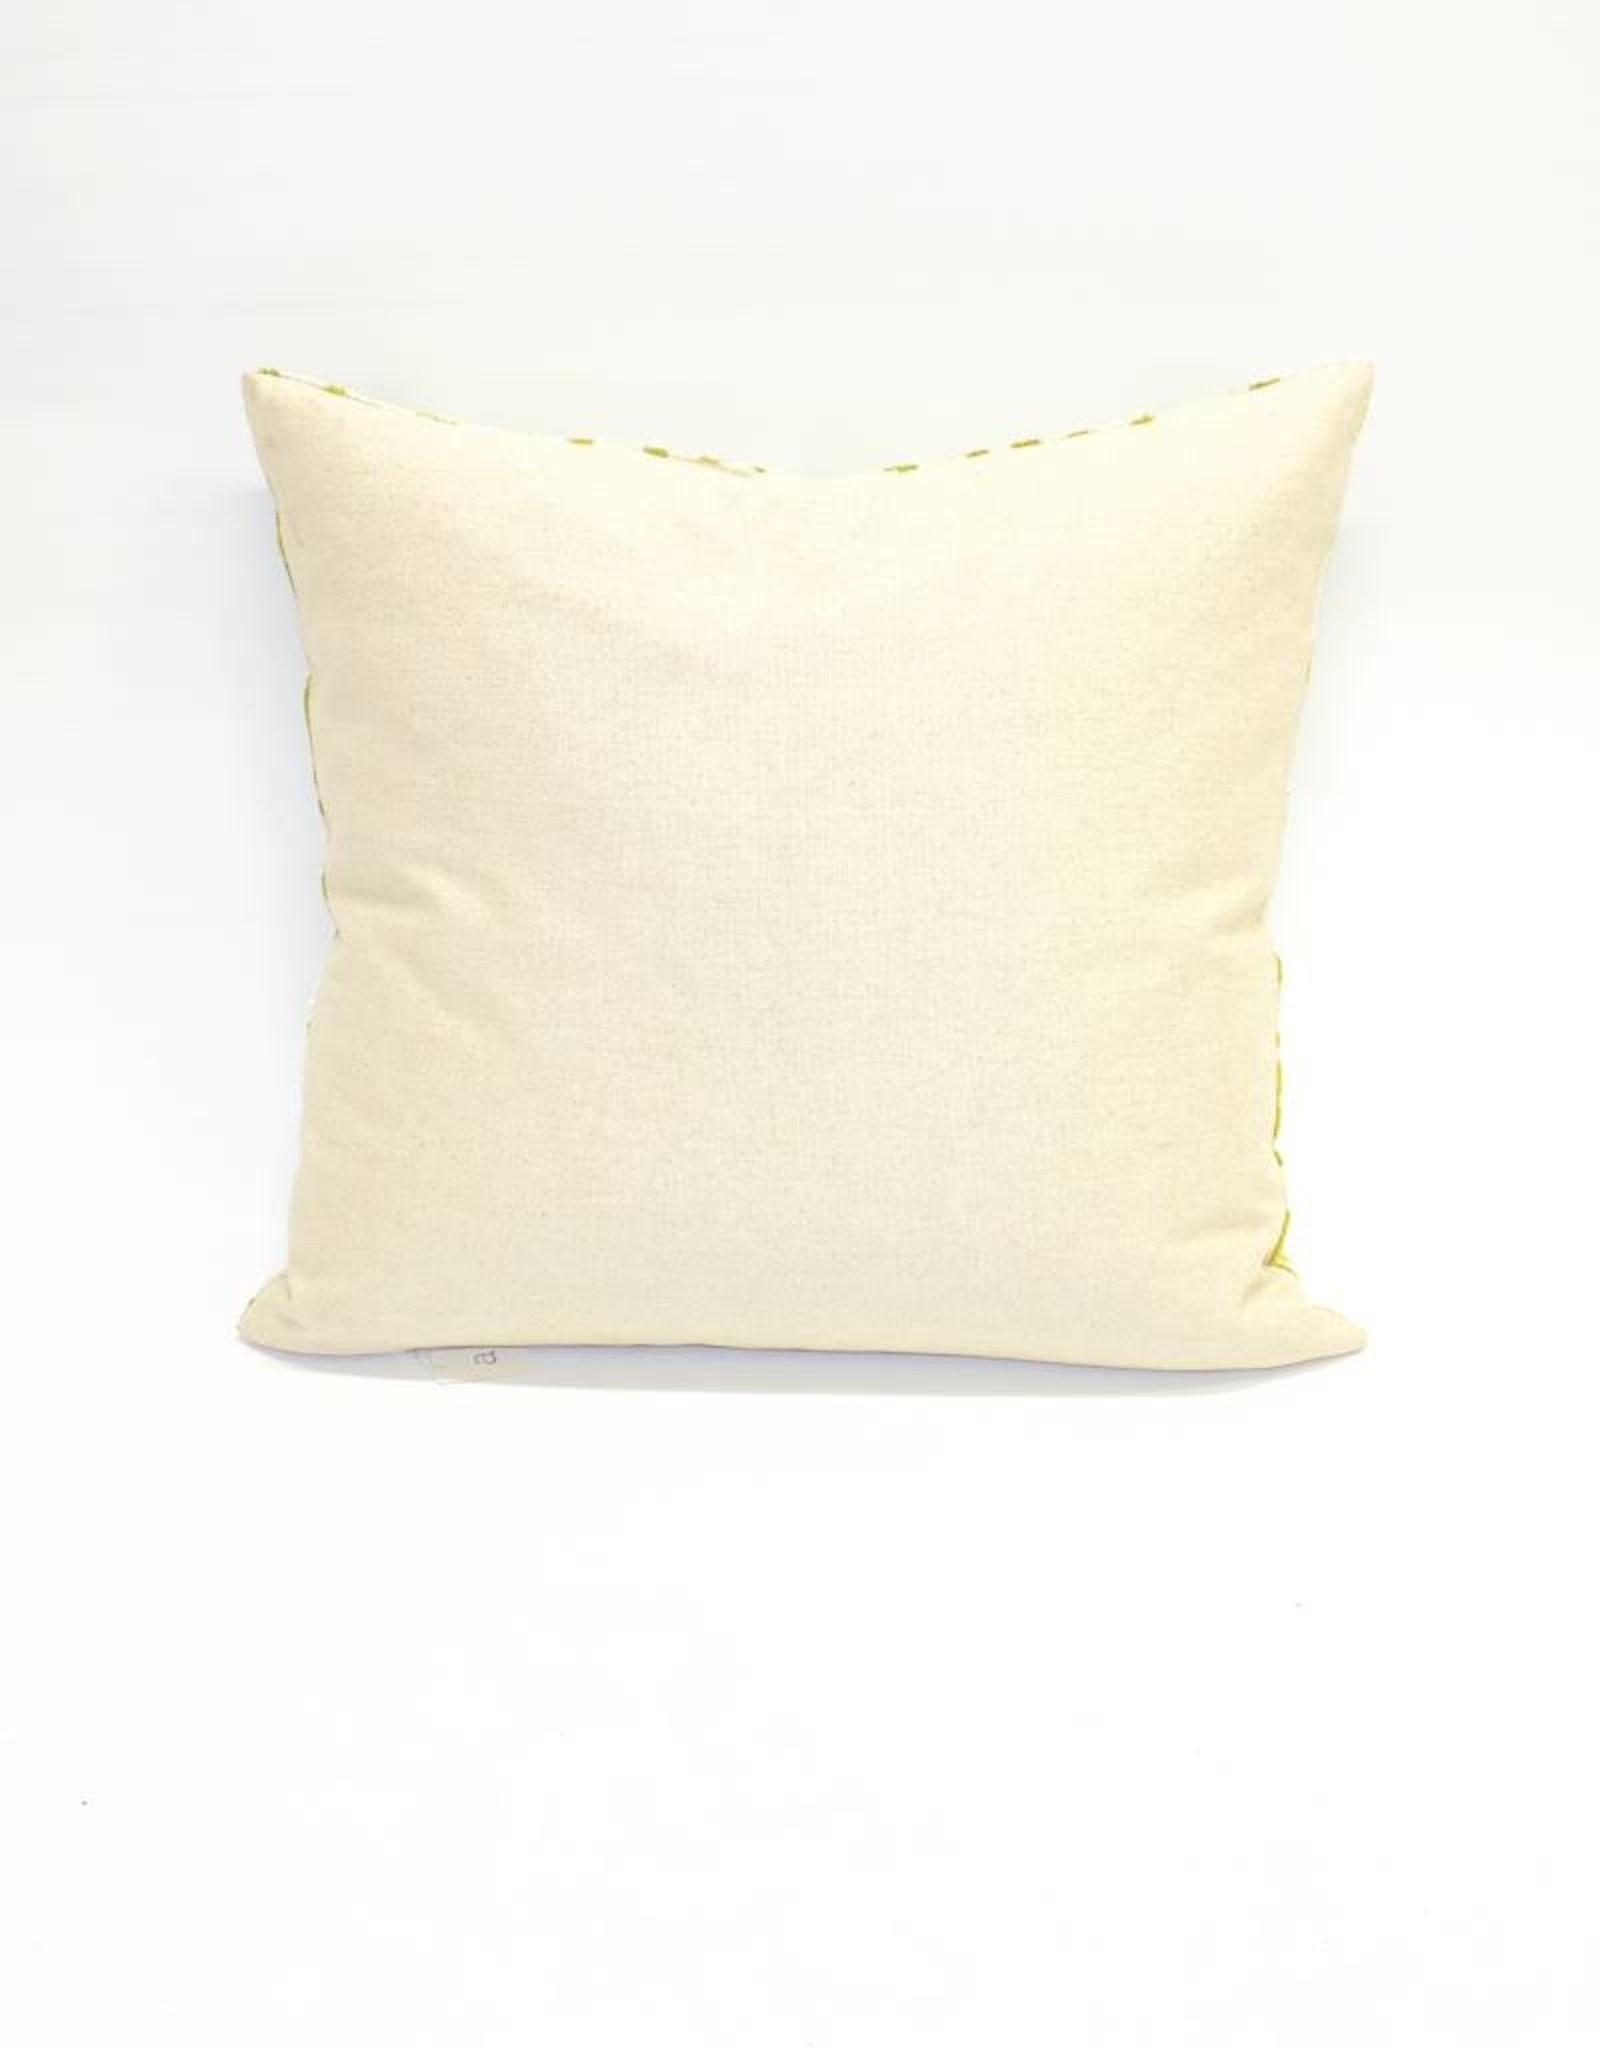 Tasdemir Rugs Ikat Silk Pillow - Large Square